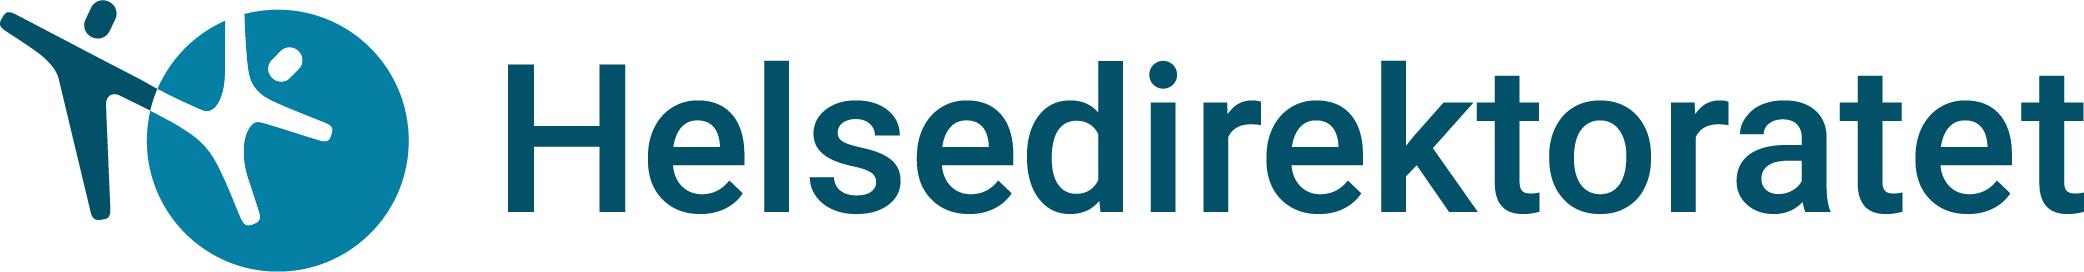 Logo helsedirektoratet (bilde)